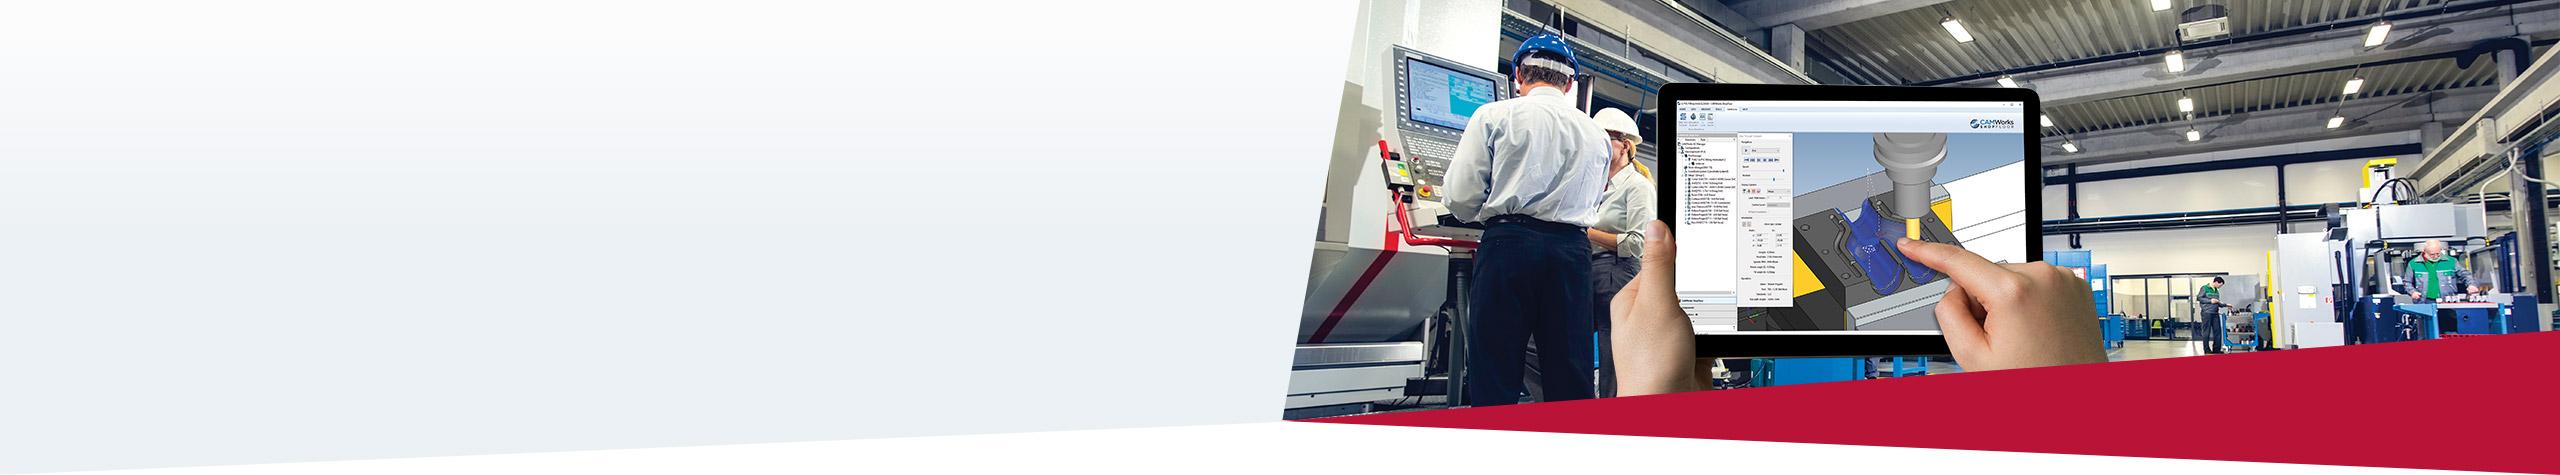 CAMWorks ShopFloor Papierlose Fertigung in der zerspanenden Fertigung.